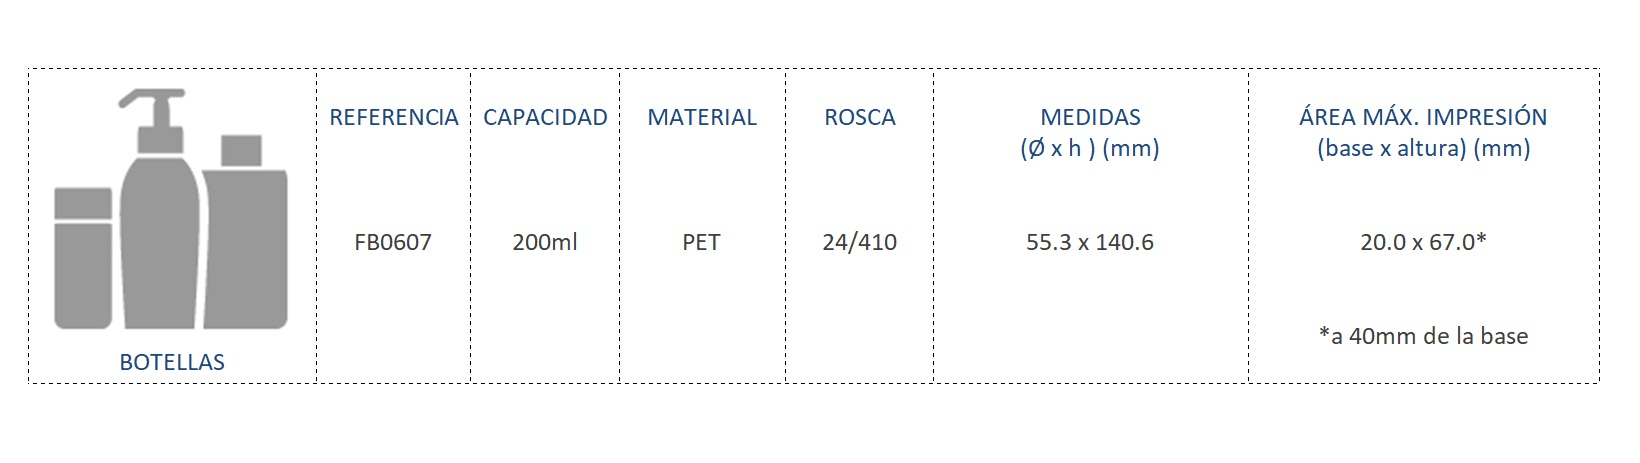 Cuadro de materiales botella FB0607